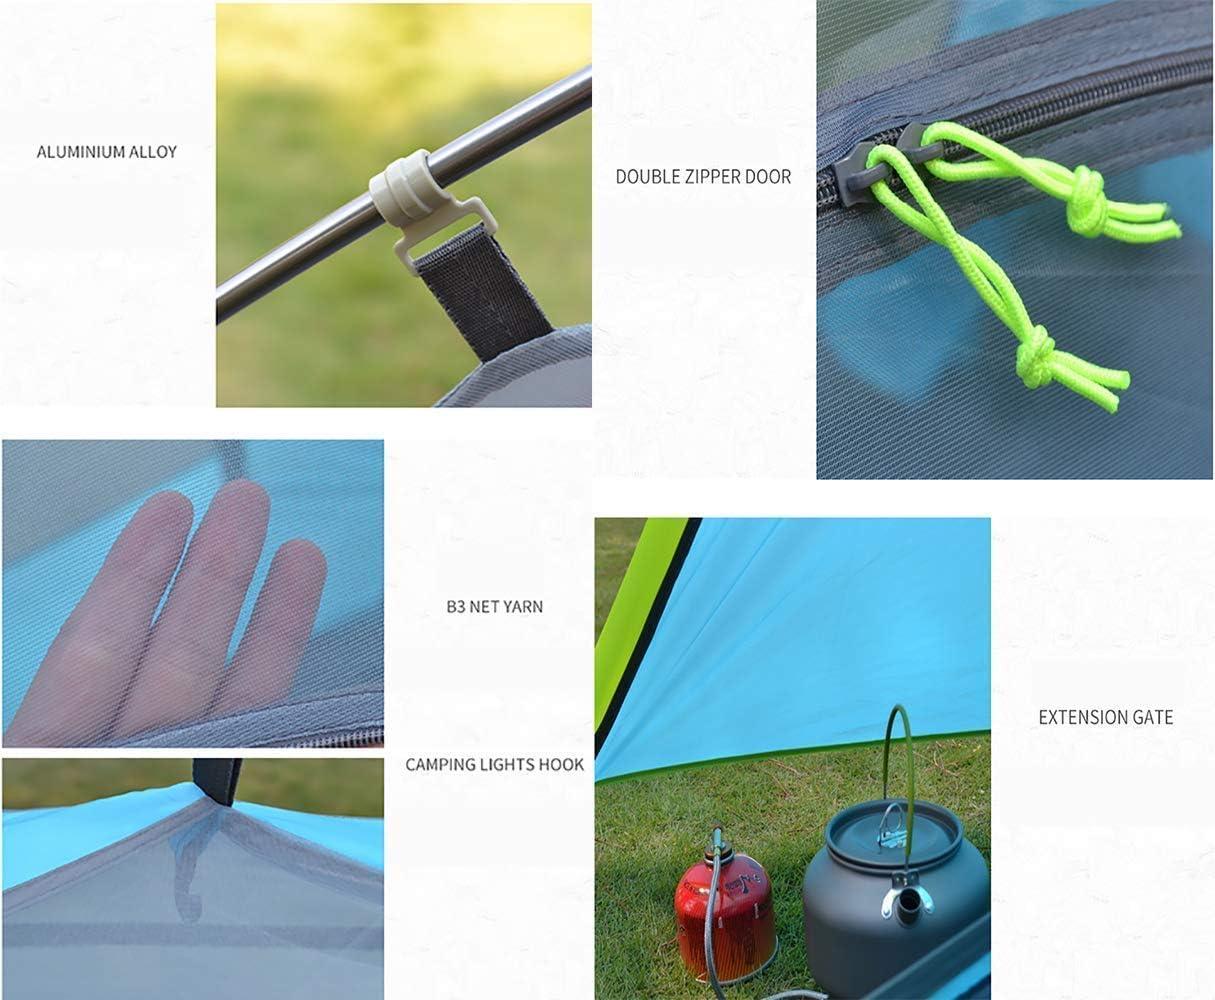 Tienda de campaña Plegable portátil para 2 Personas Carpas instantáneas Sun Shelter Impermeable para Deportes al Aire Libre Senderismo Viajes Rainfly Orange